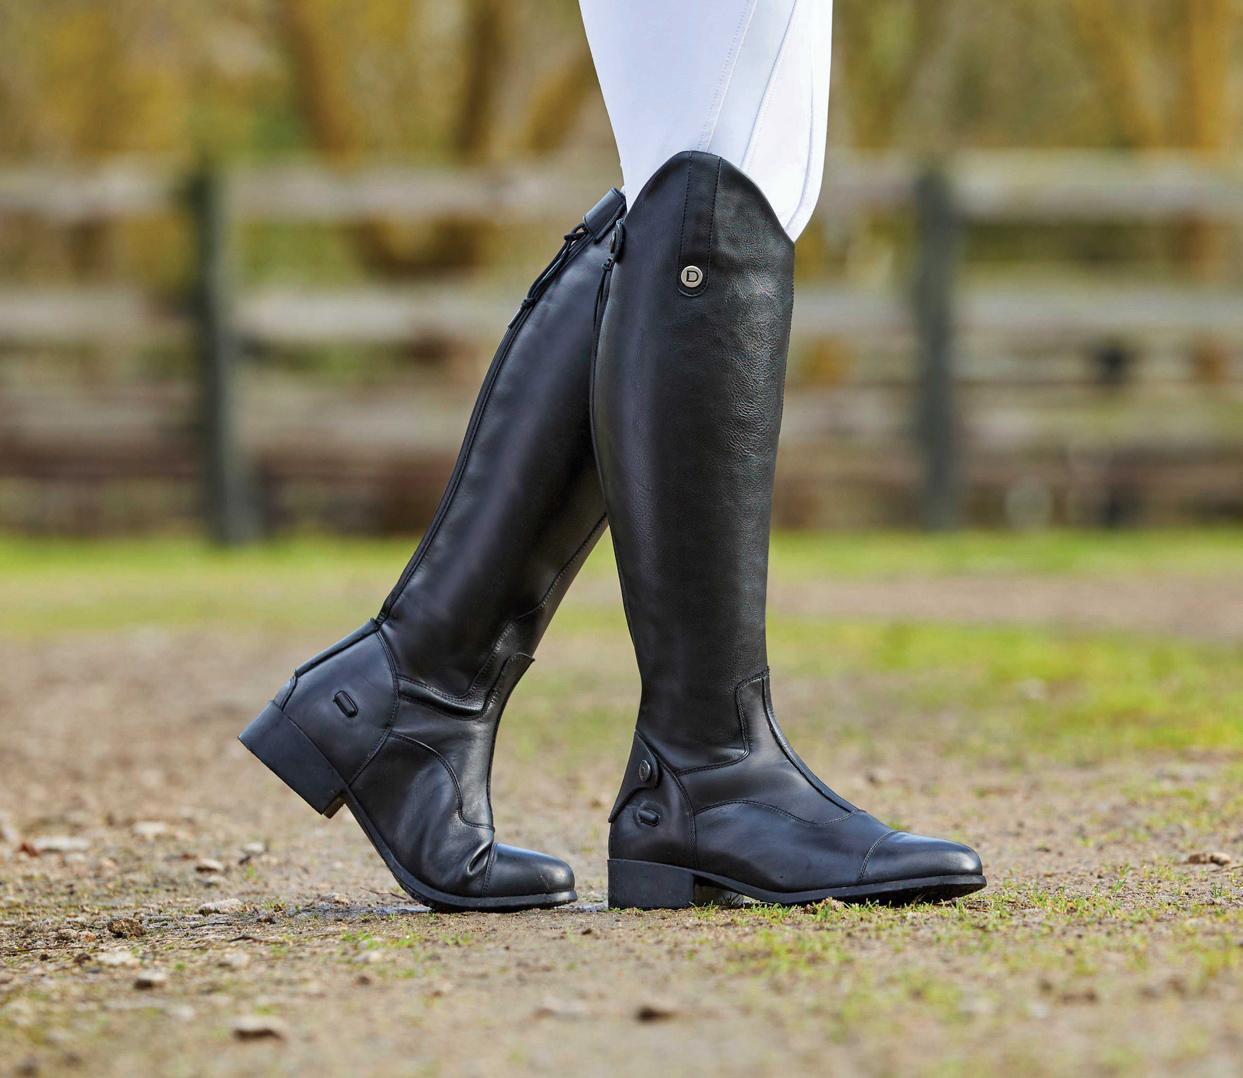 Dublin arderin Field Womens Boots long Riding-Black All Sizes